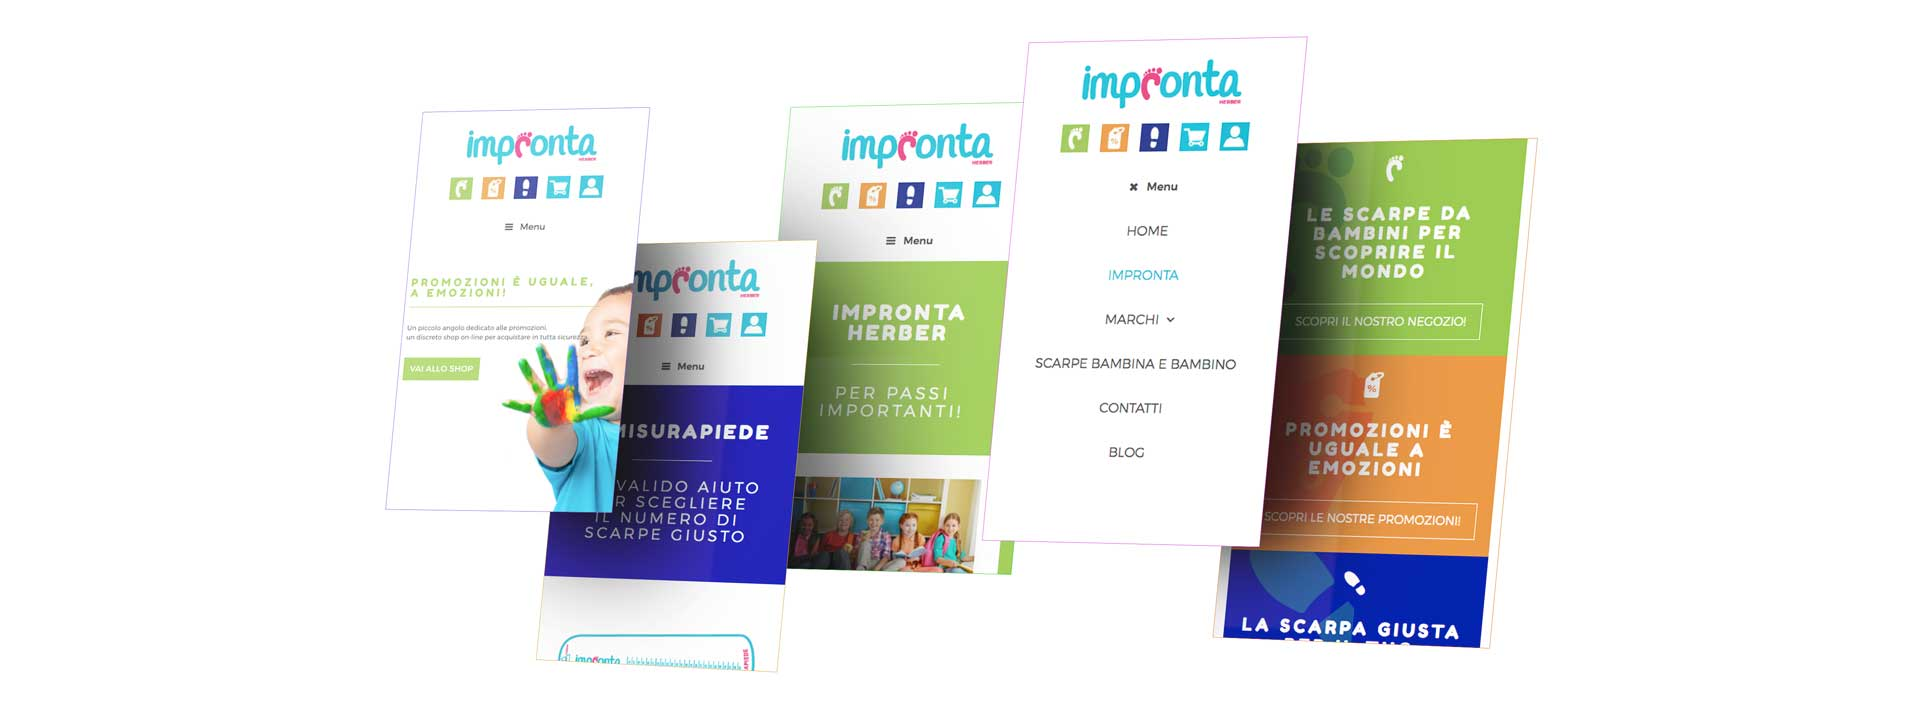 GSite Impronta Herber mobile version